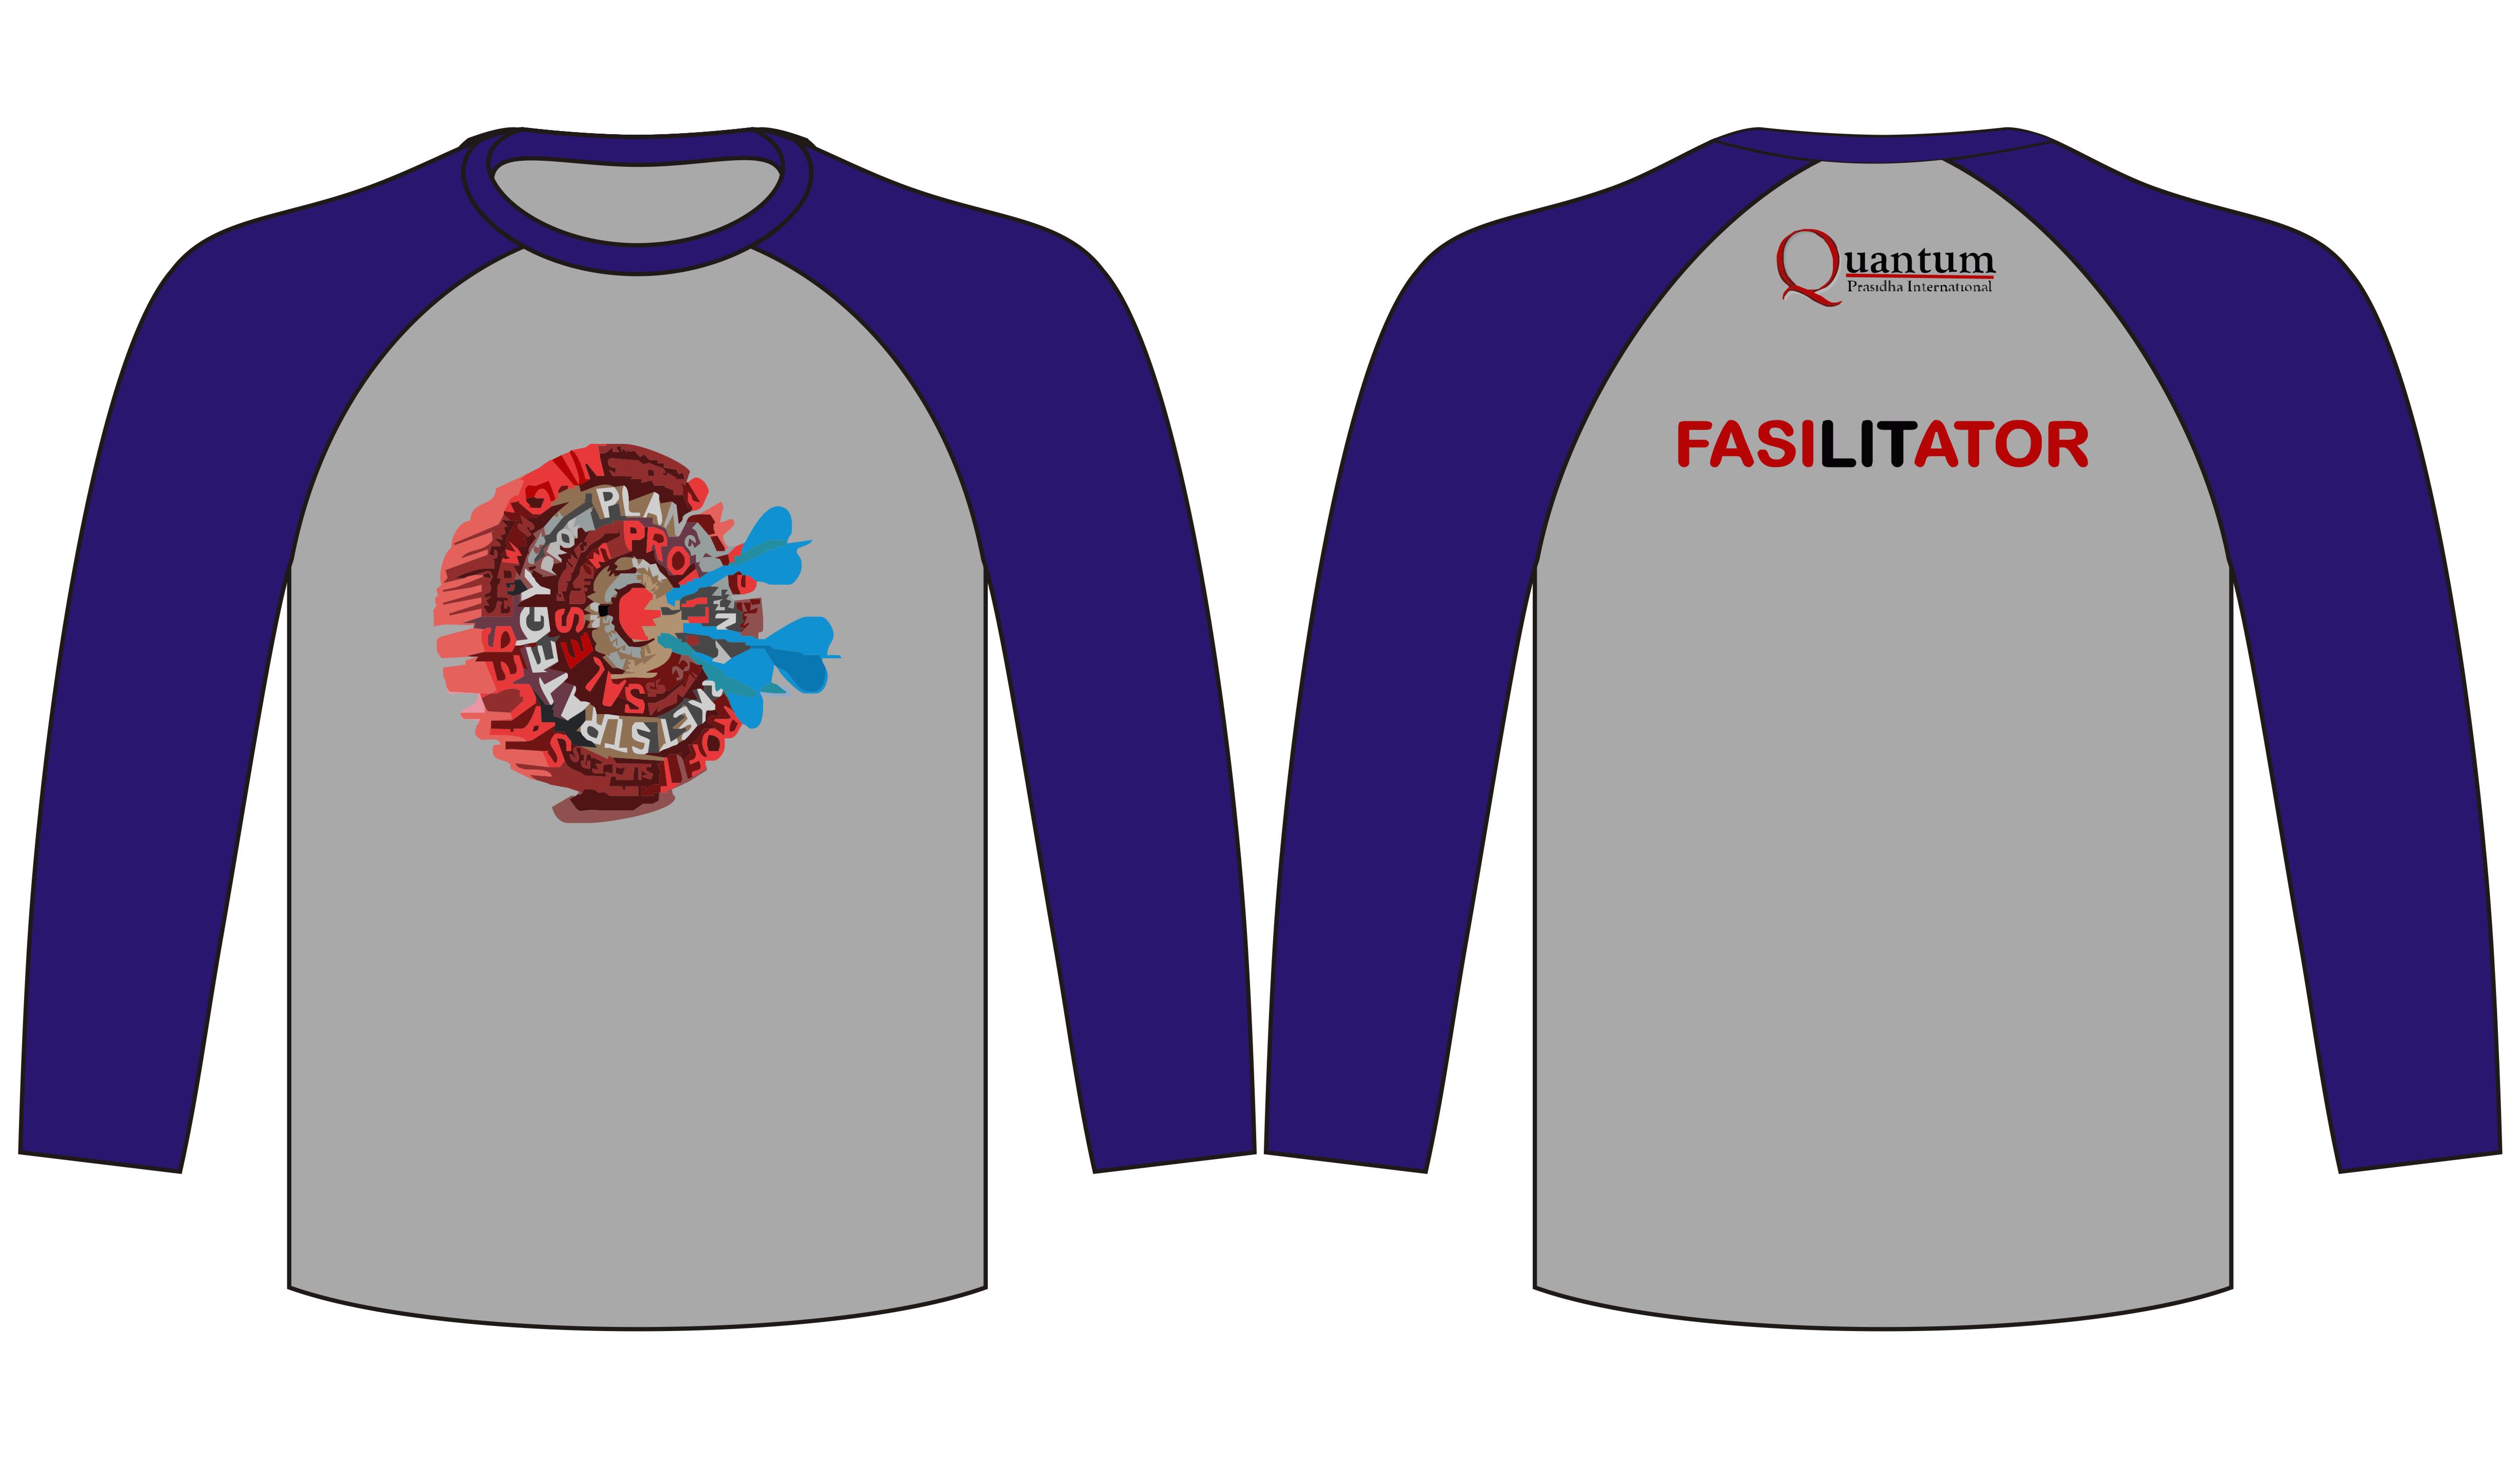 Kaos Raglan Quantum, Seragam T-Shirt